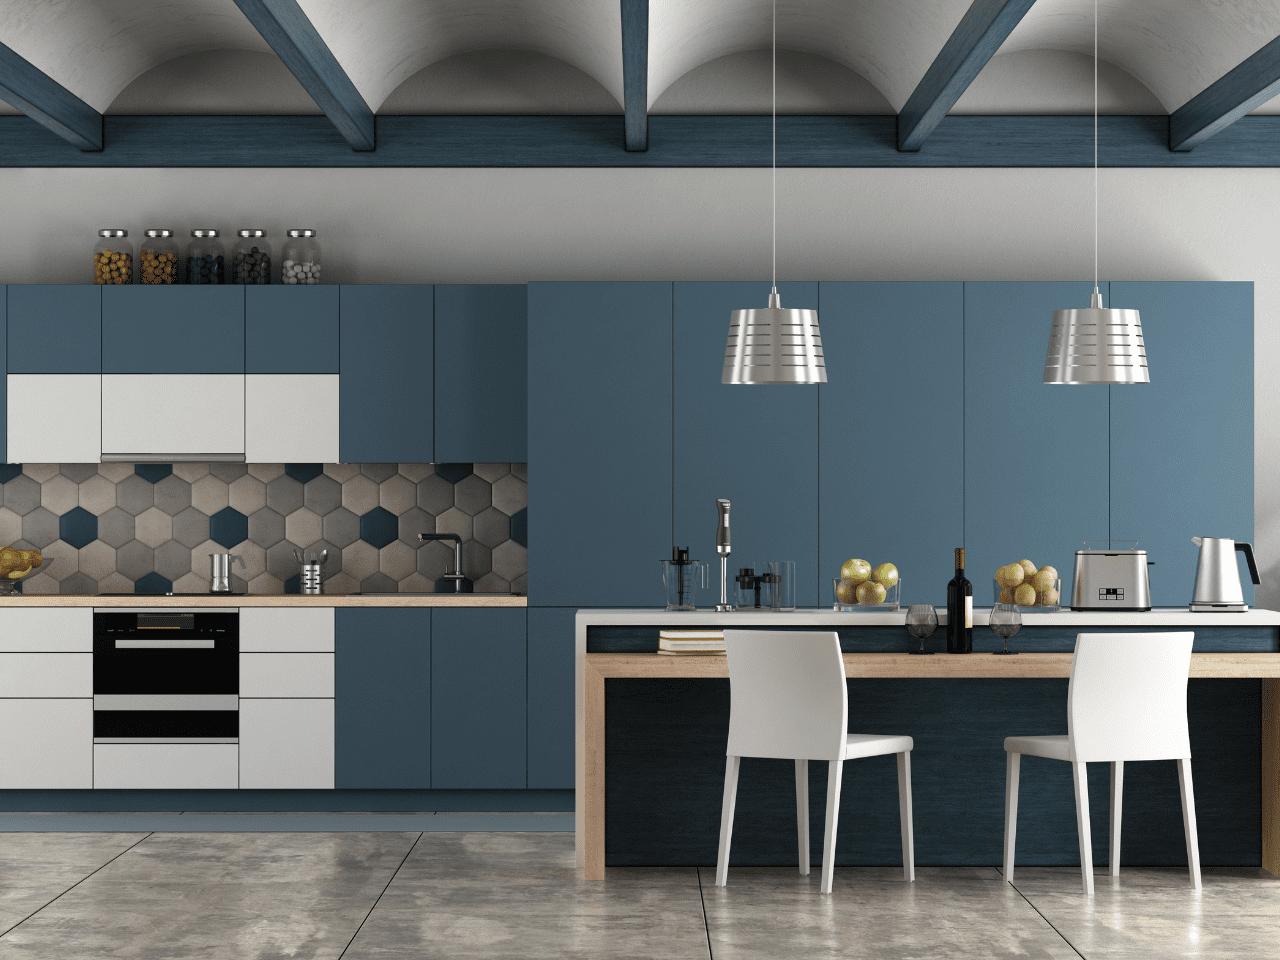 abbinare cucina e pavimento